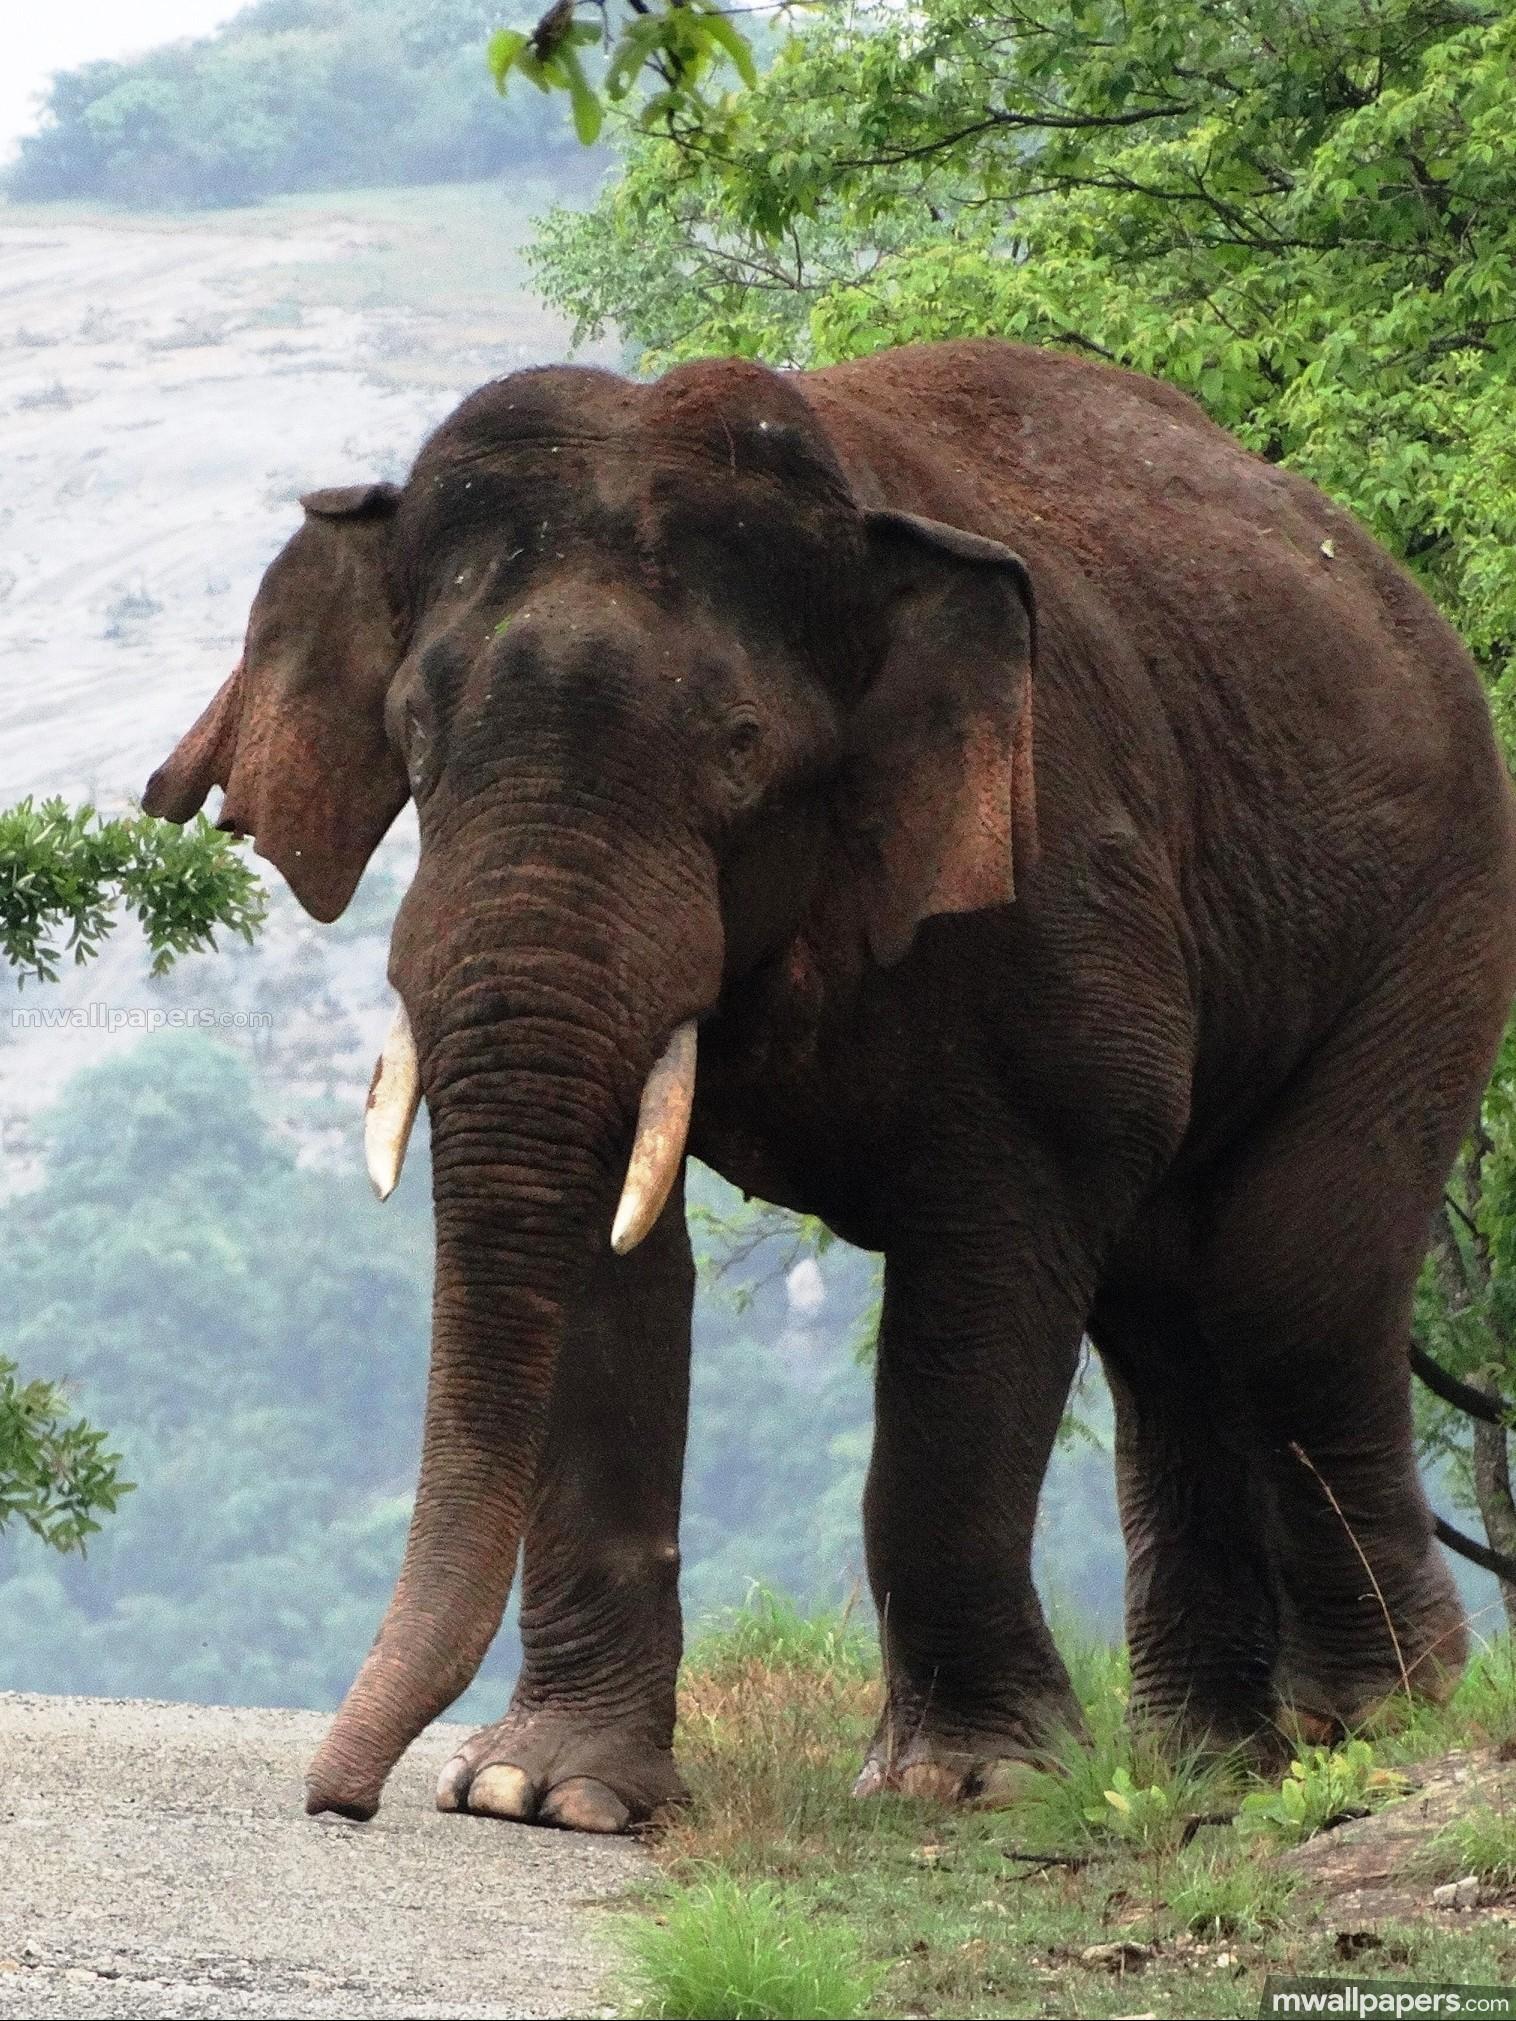 Res: 1516x2021, Elephants HD Photos & Wallpapers (1080p) - elephants,animal,hd images,